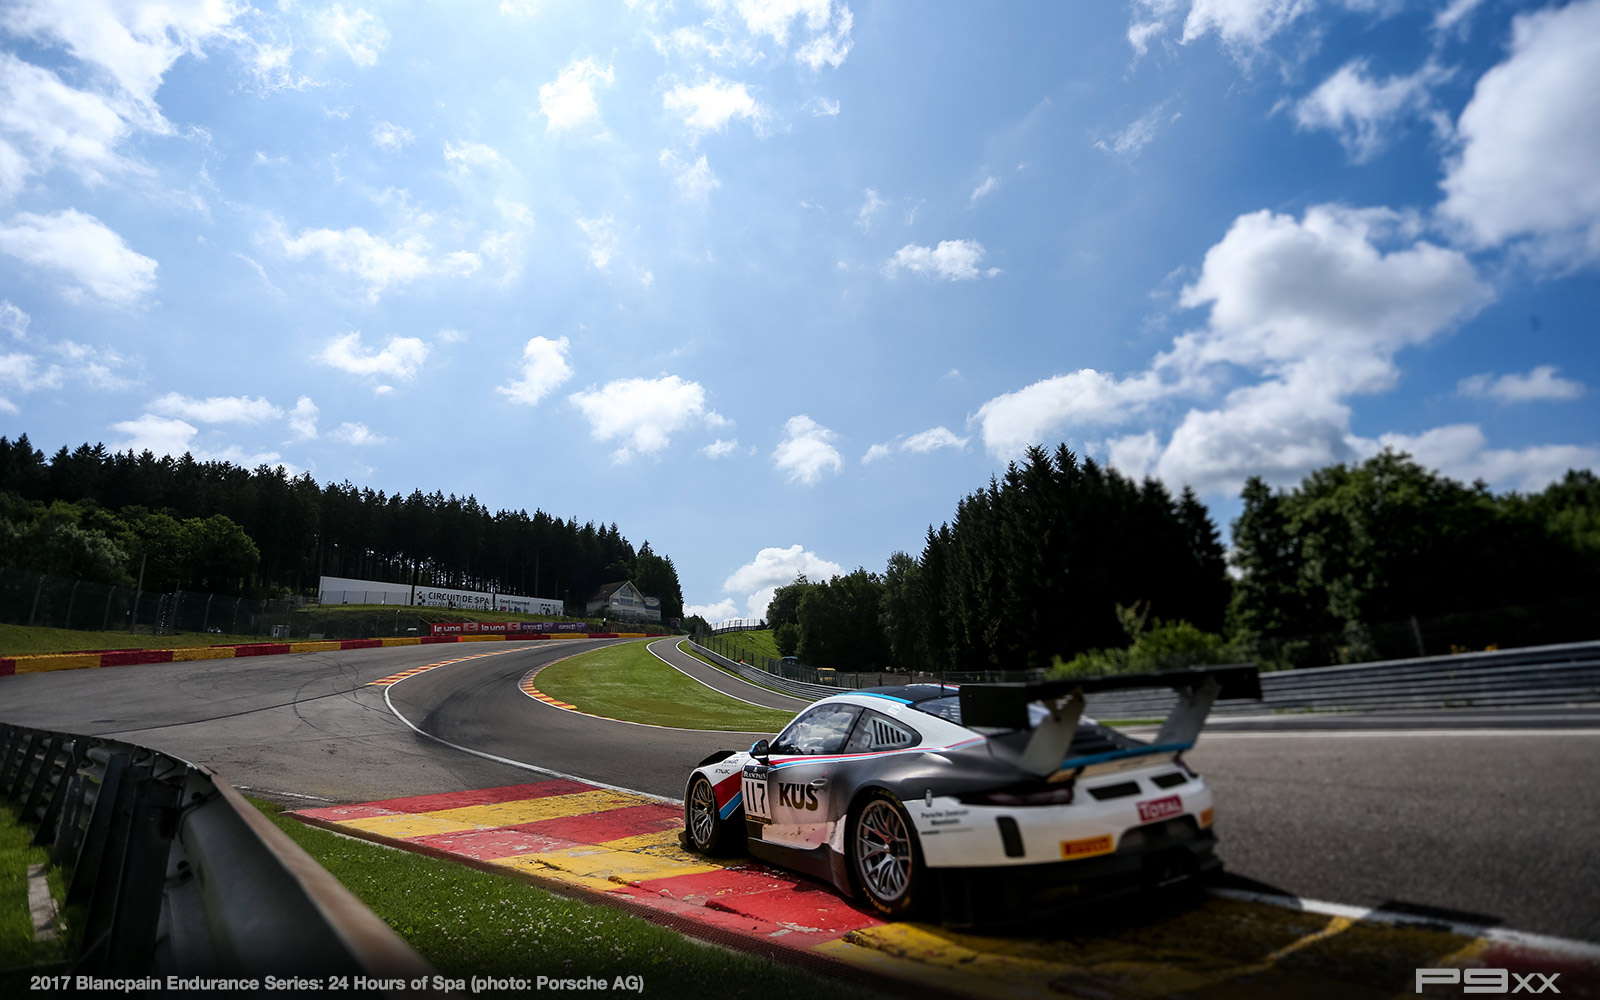 2017-24-Hours-of-Spa-Porsche-285